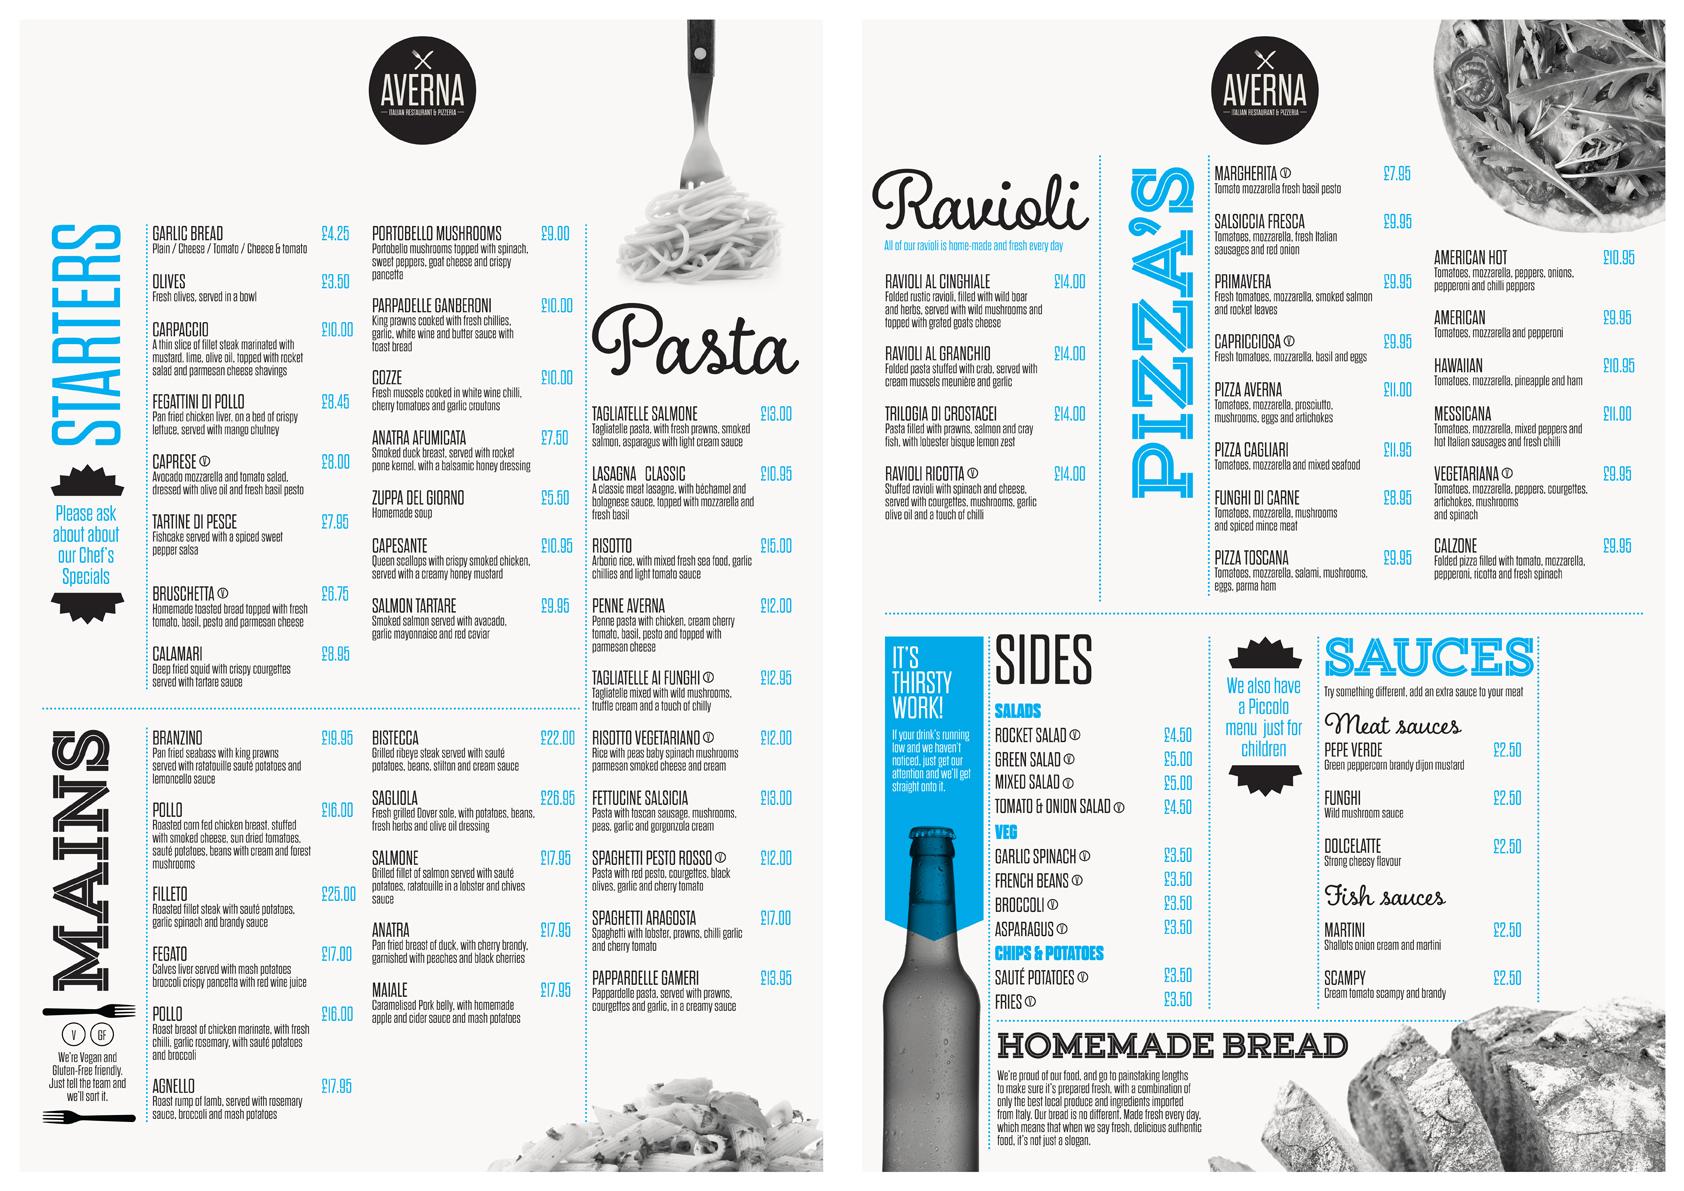 Averna_Claygate_takeaway_menu_online.jpg